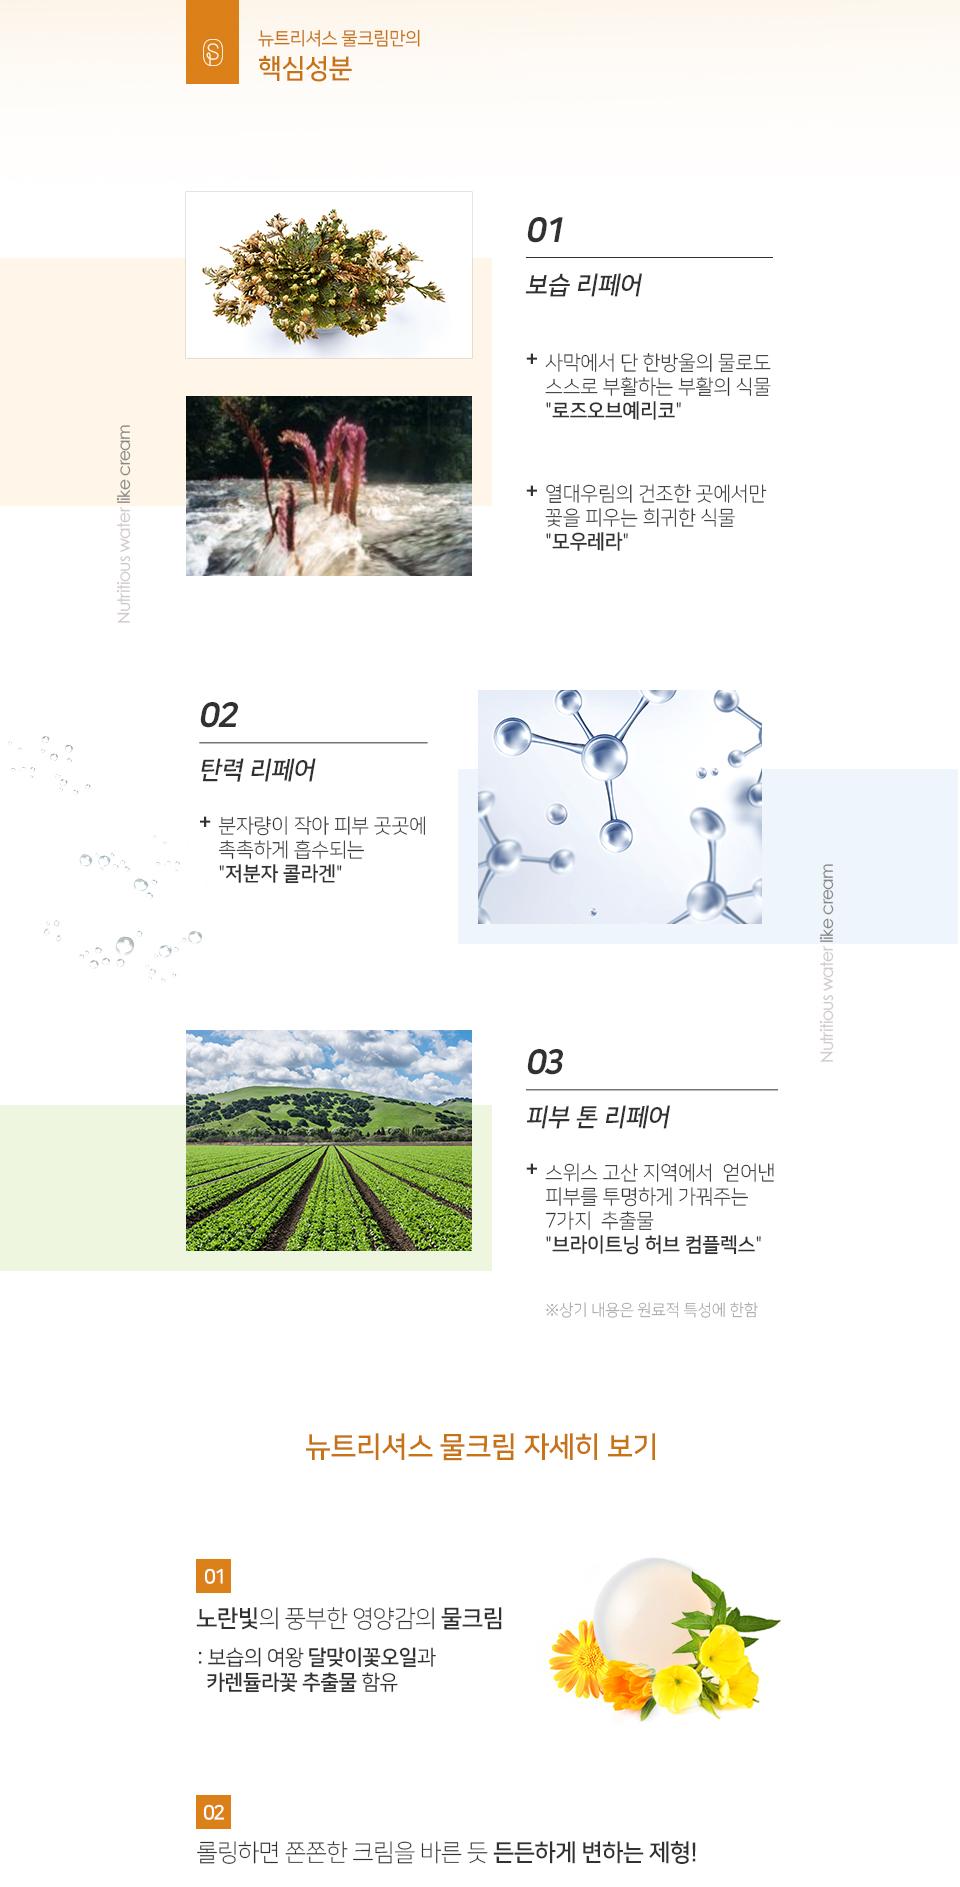 Mod3_Nutritious Water like Cream_05.jpg